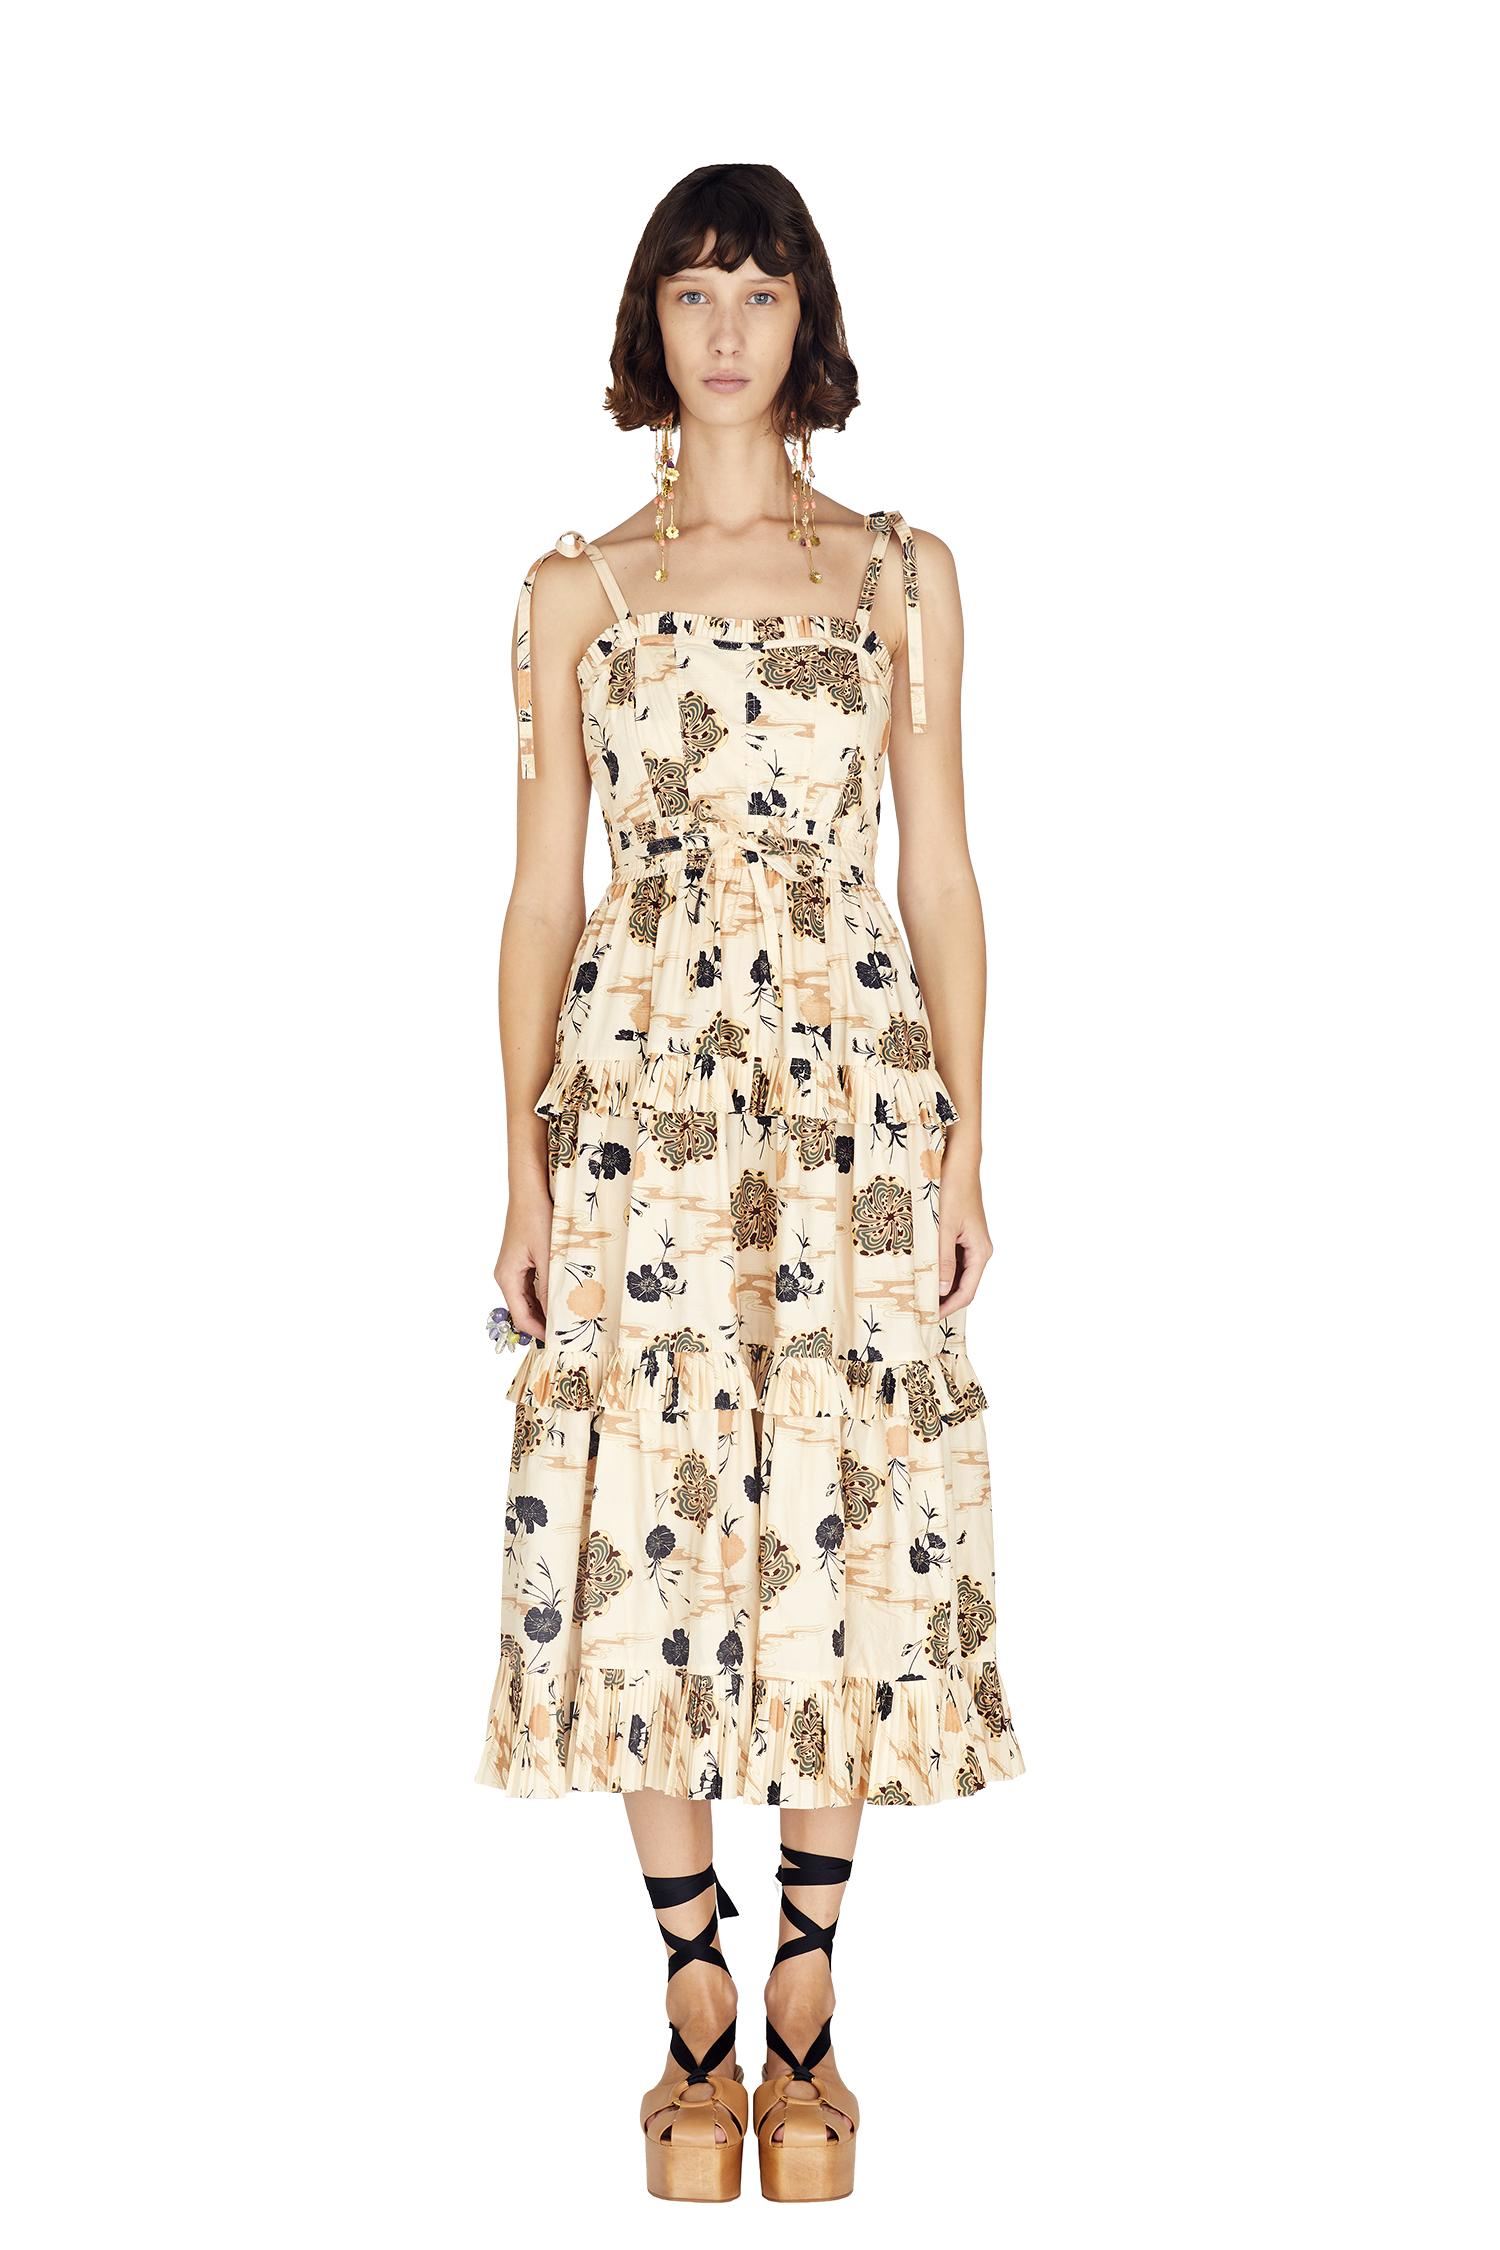 LUNE DRESS, Ulla Johnson, SUMMER 2021, RUNWAY LOOK